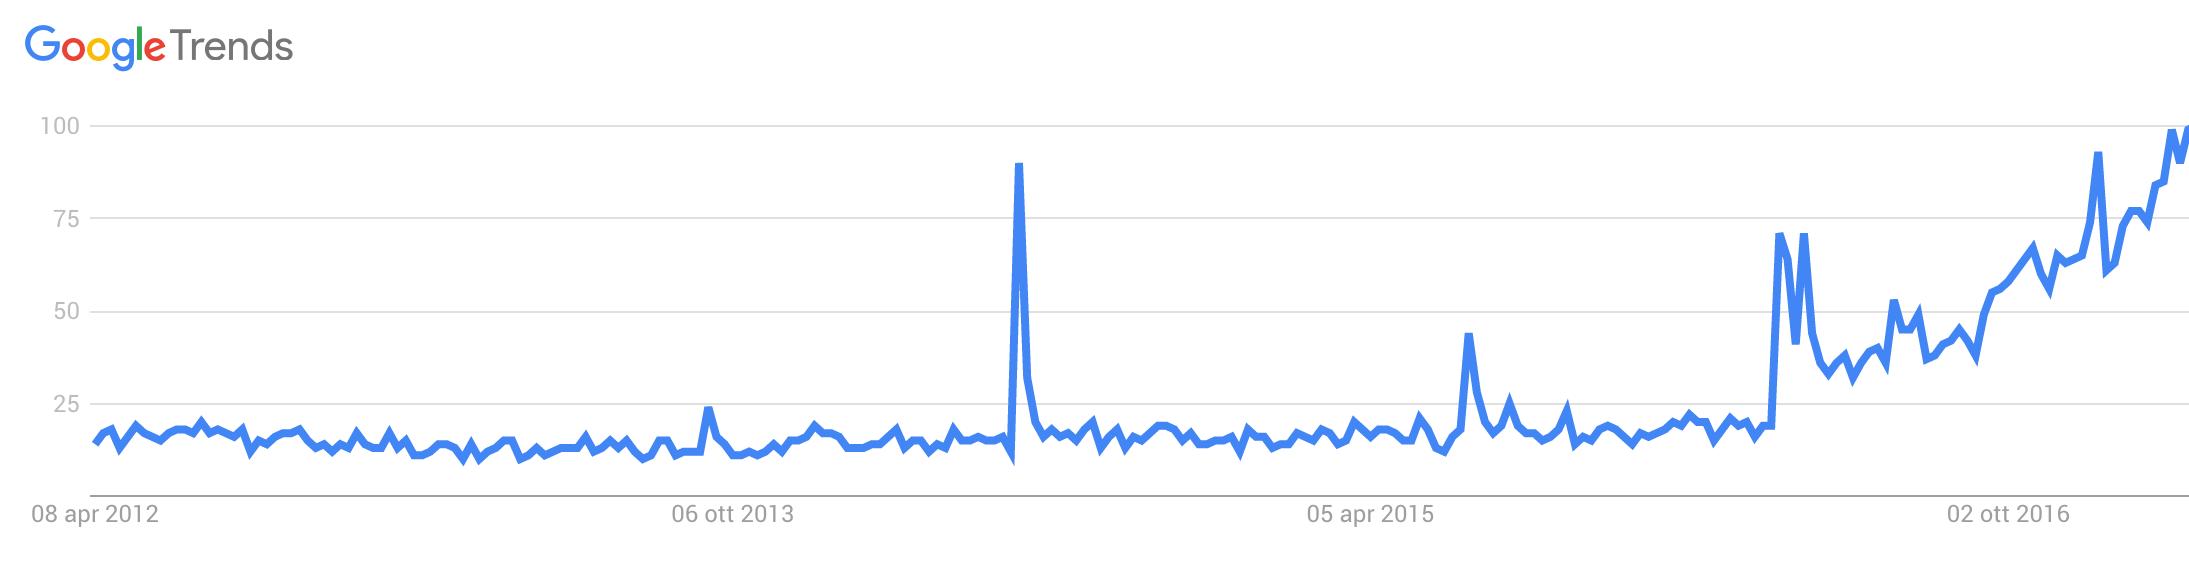 chatbot cosa devi sapere trending topic